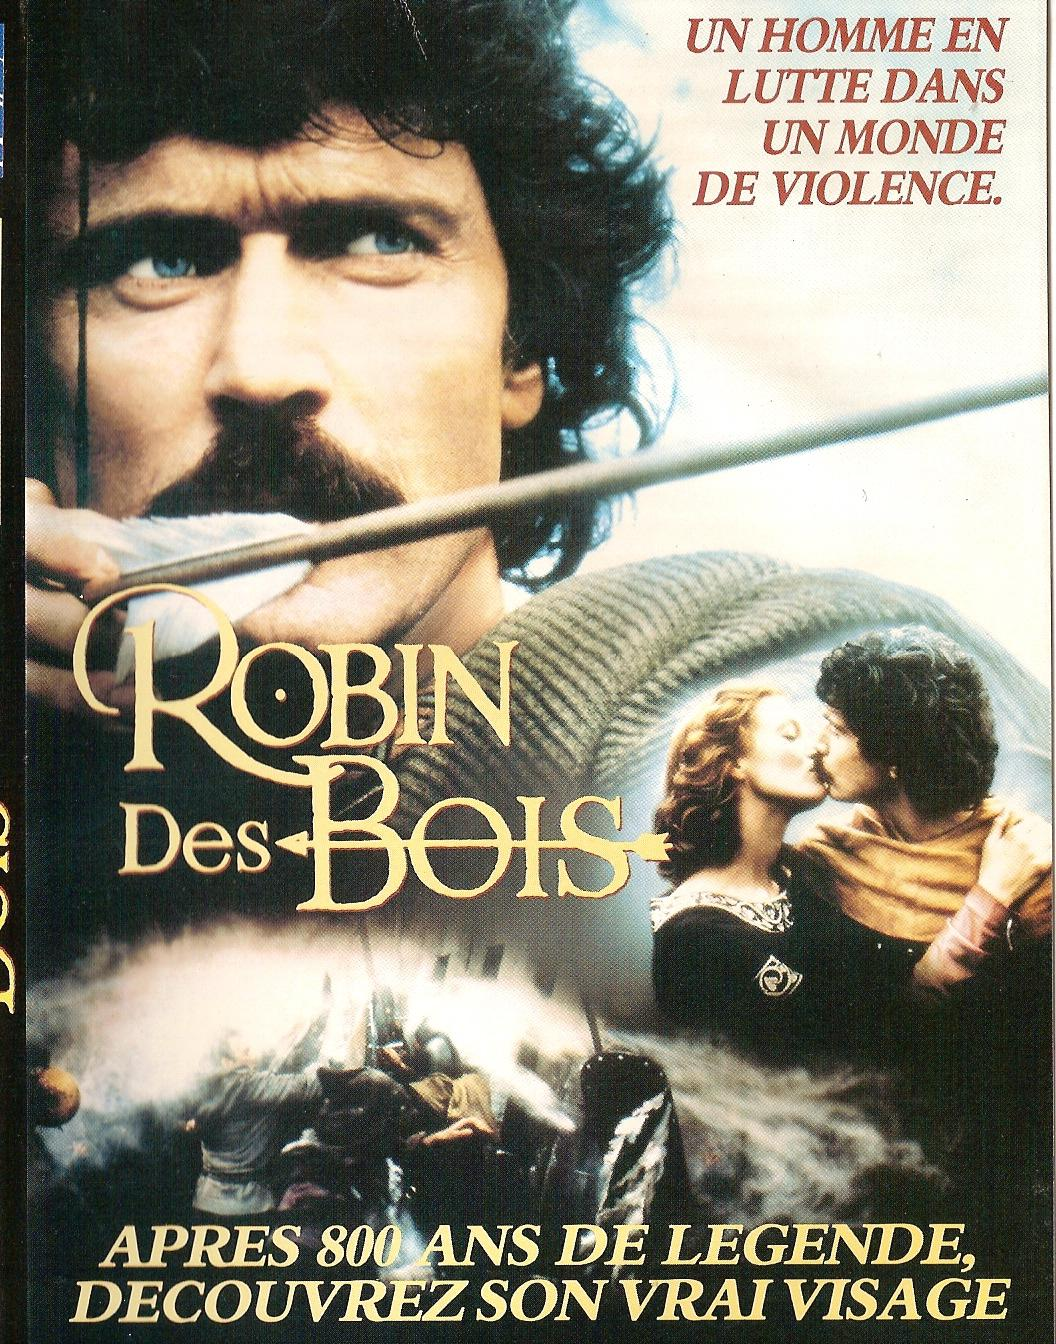 Robin des Bois [film 1991] ~ Robin Des Bois Le Film